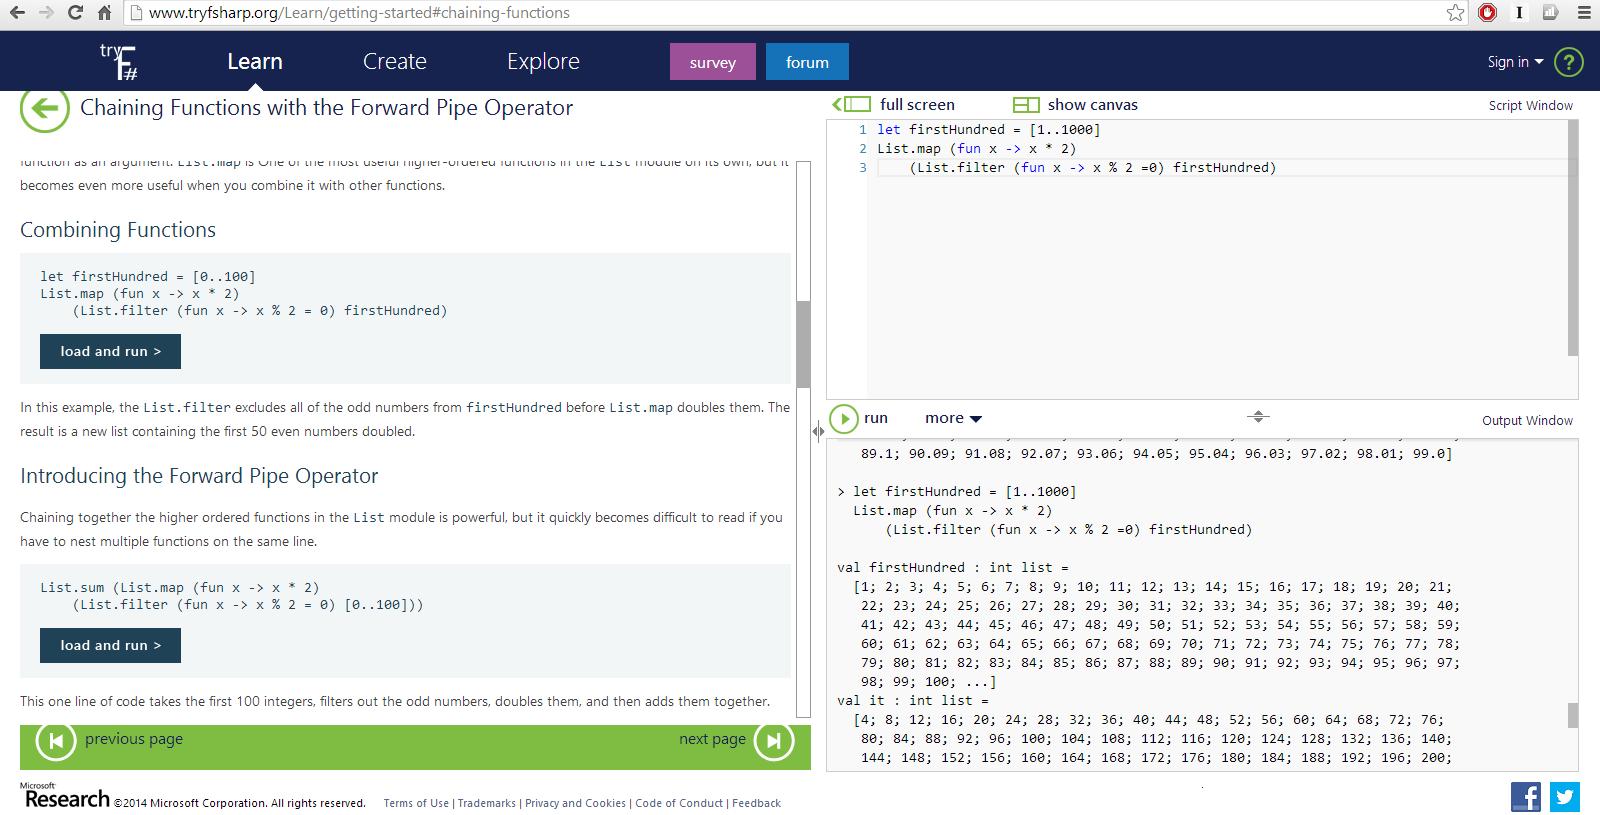 Разработка приложения на Android с помощью Xamarin и F#